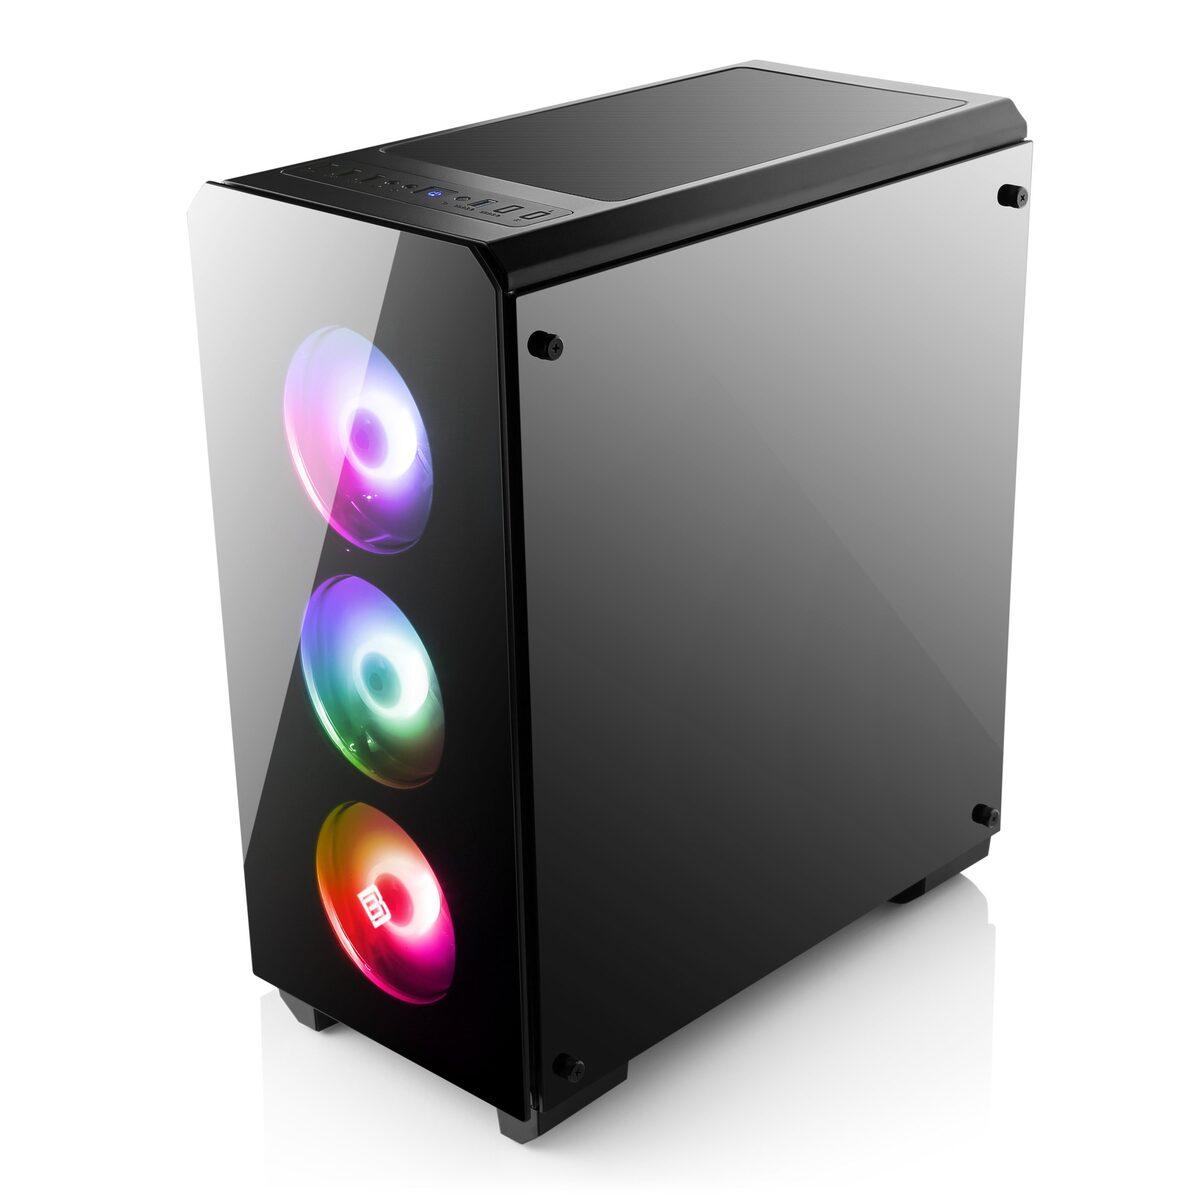 Bild 4 von CSL Levitas T8118 Windows 10 Home Gaming-PC (AMD Ryzen 3, Radeon Vega 8, 16 GB RAM, 1000 GB SSD, AMD Ryzen 3 3200G, Vega 8, 16 GB RAM, SSD)